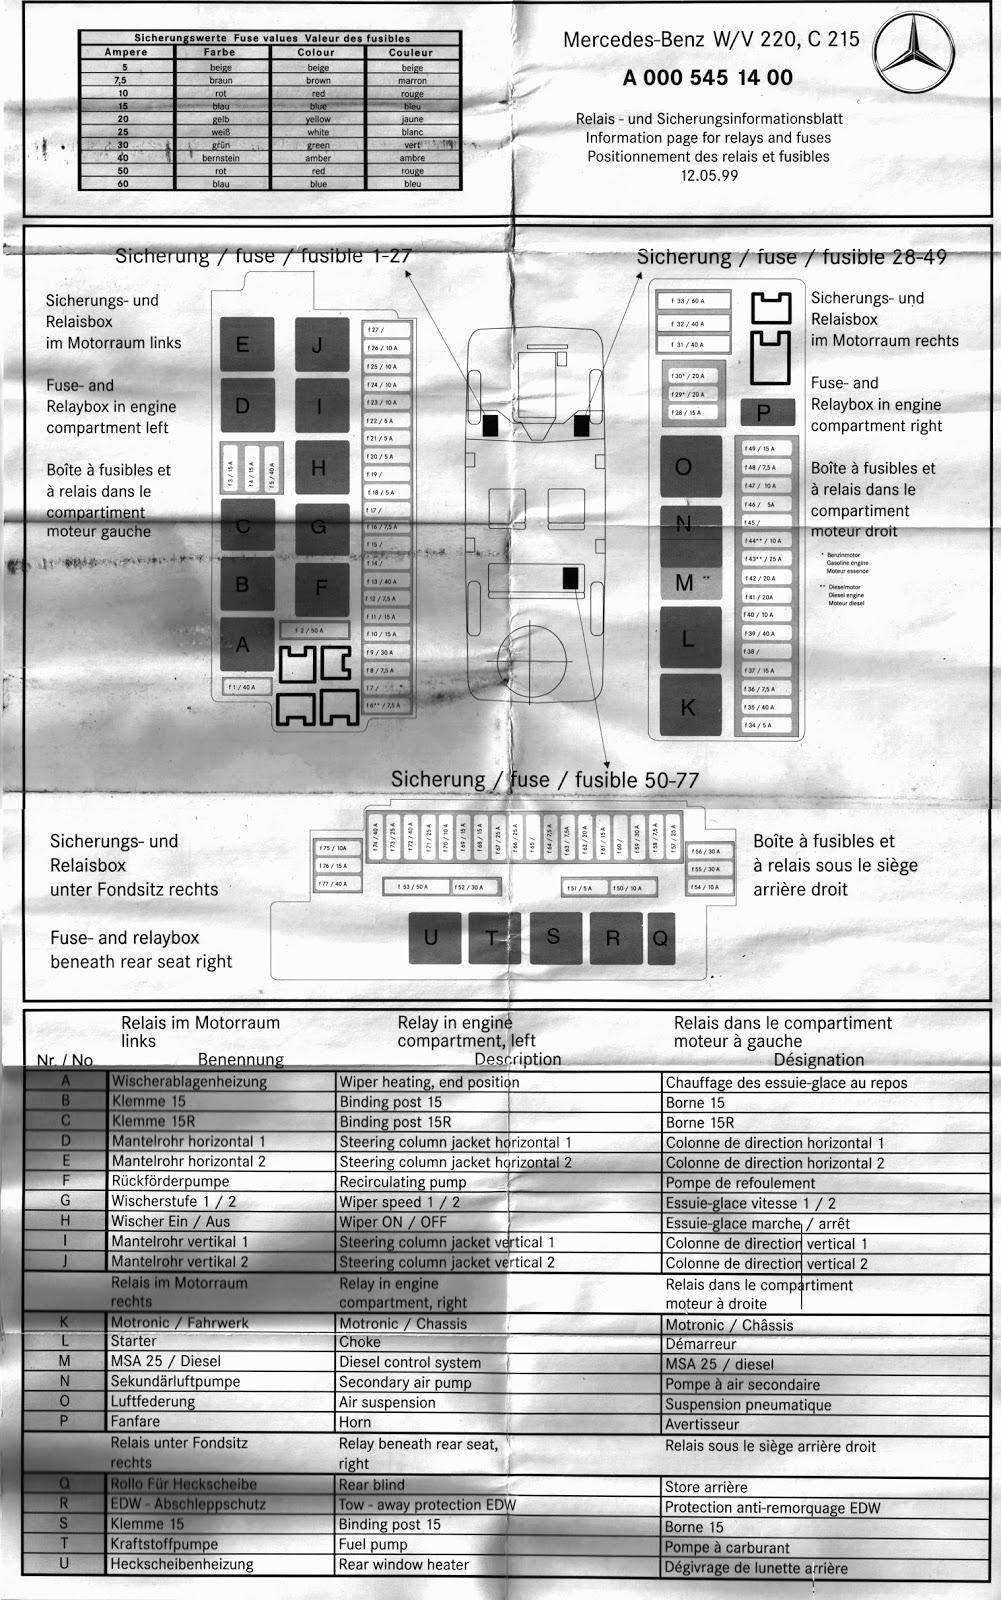 2004 mercede s430 fuse diagram - wiring diagram example  wiring diagram example